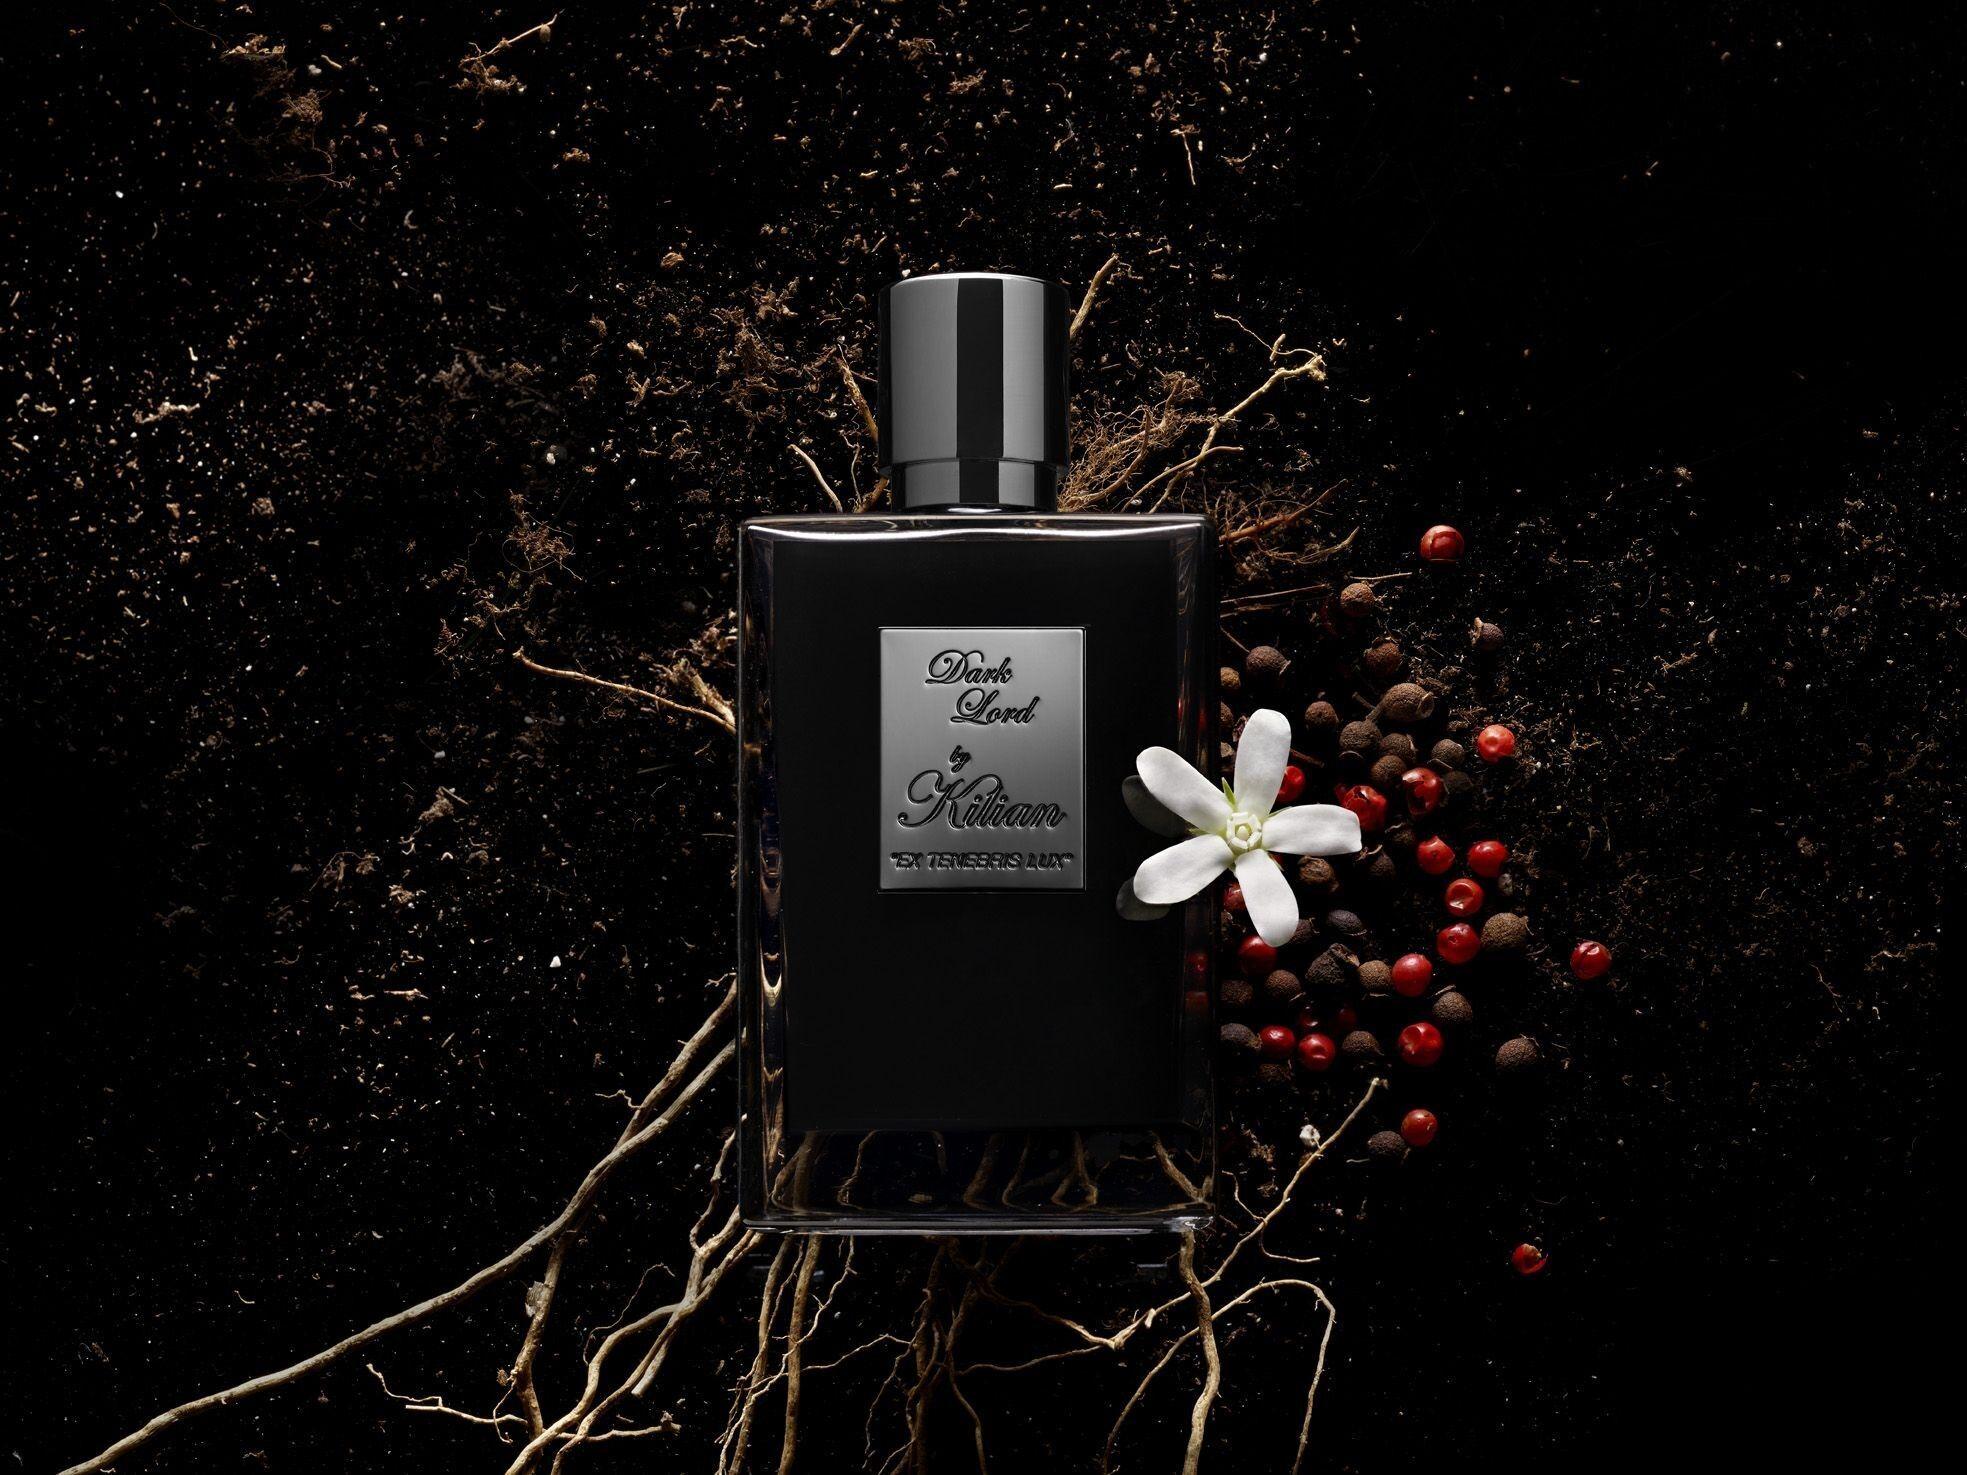 Kilian Dark Lord мужественный аромат разработан испанским парфюмером Альберто Морильясом